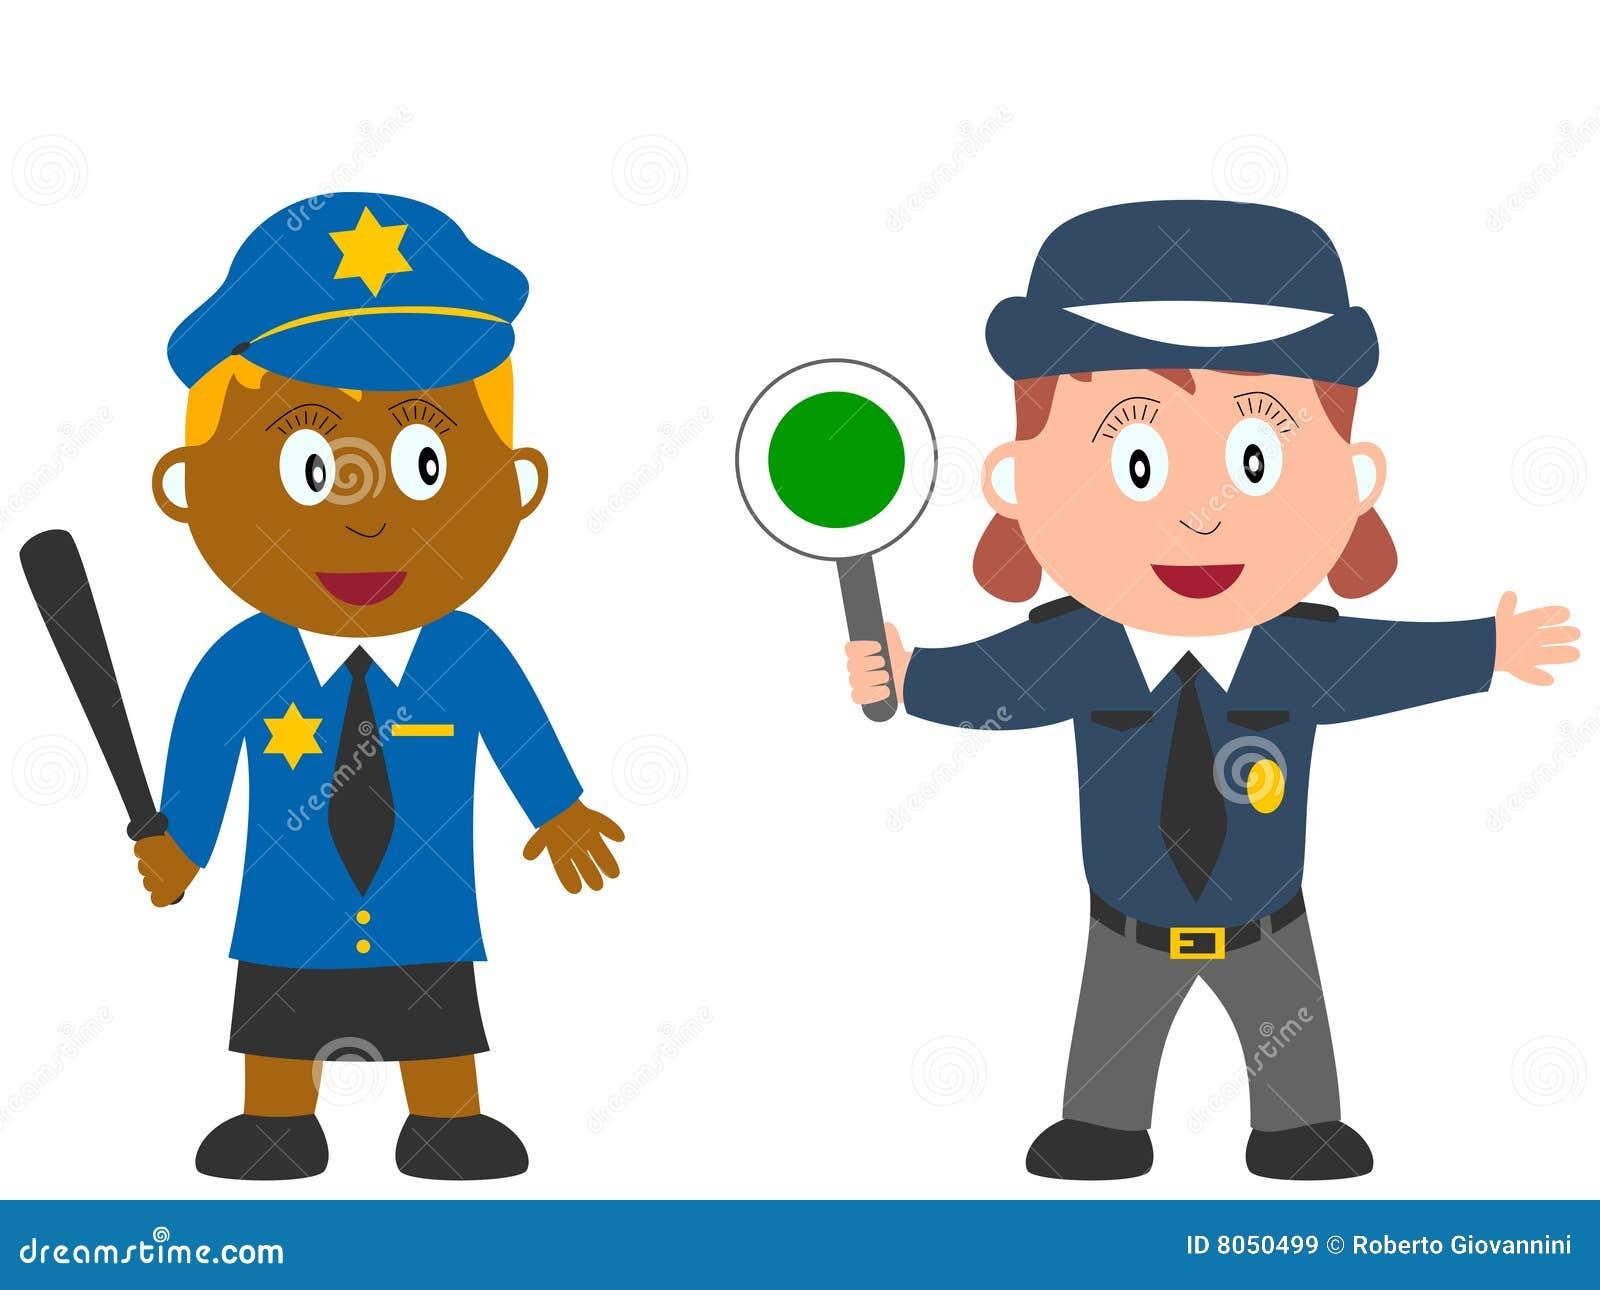 Policewoman Stock Illustrations – 251 Policewoman Stock ...